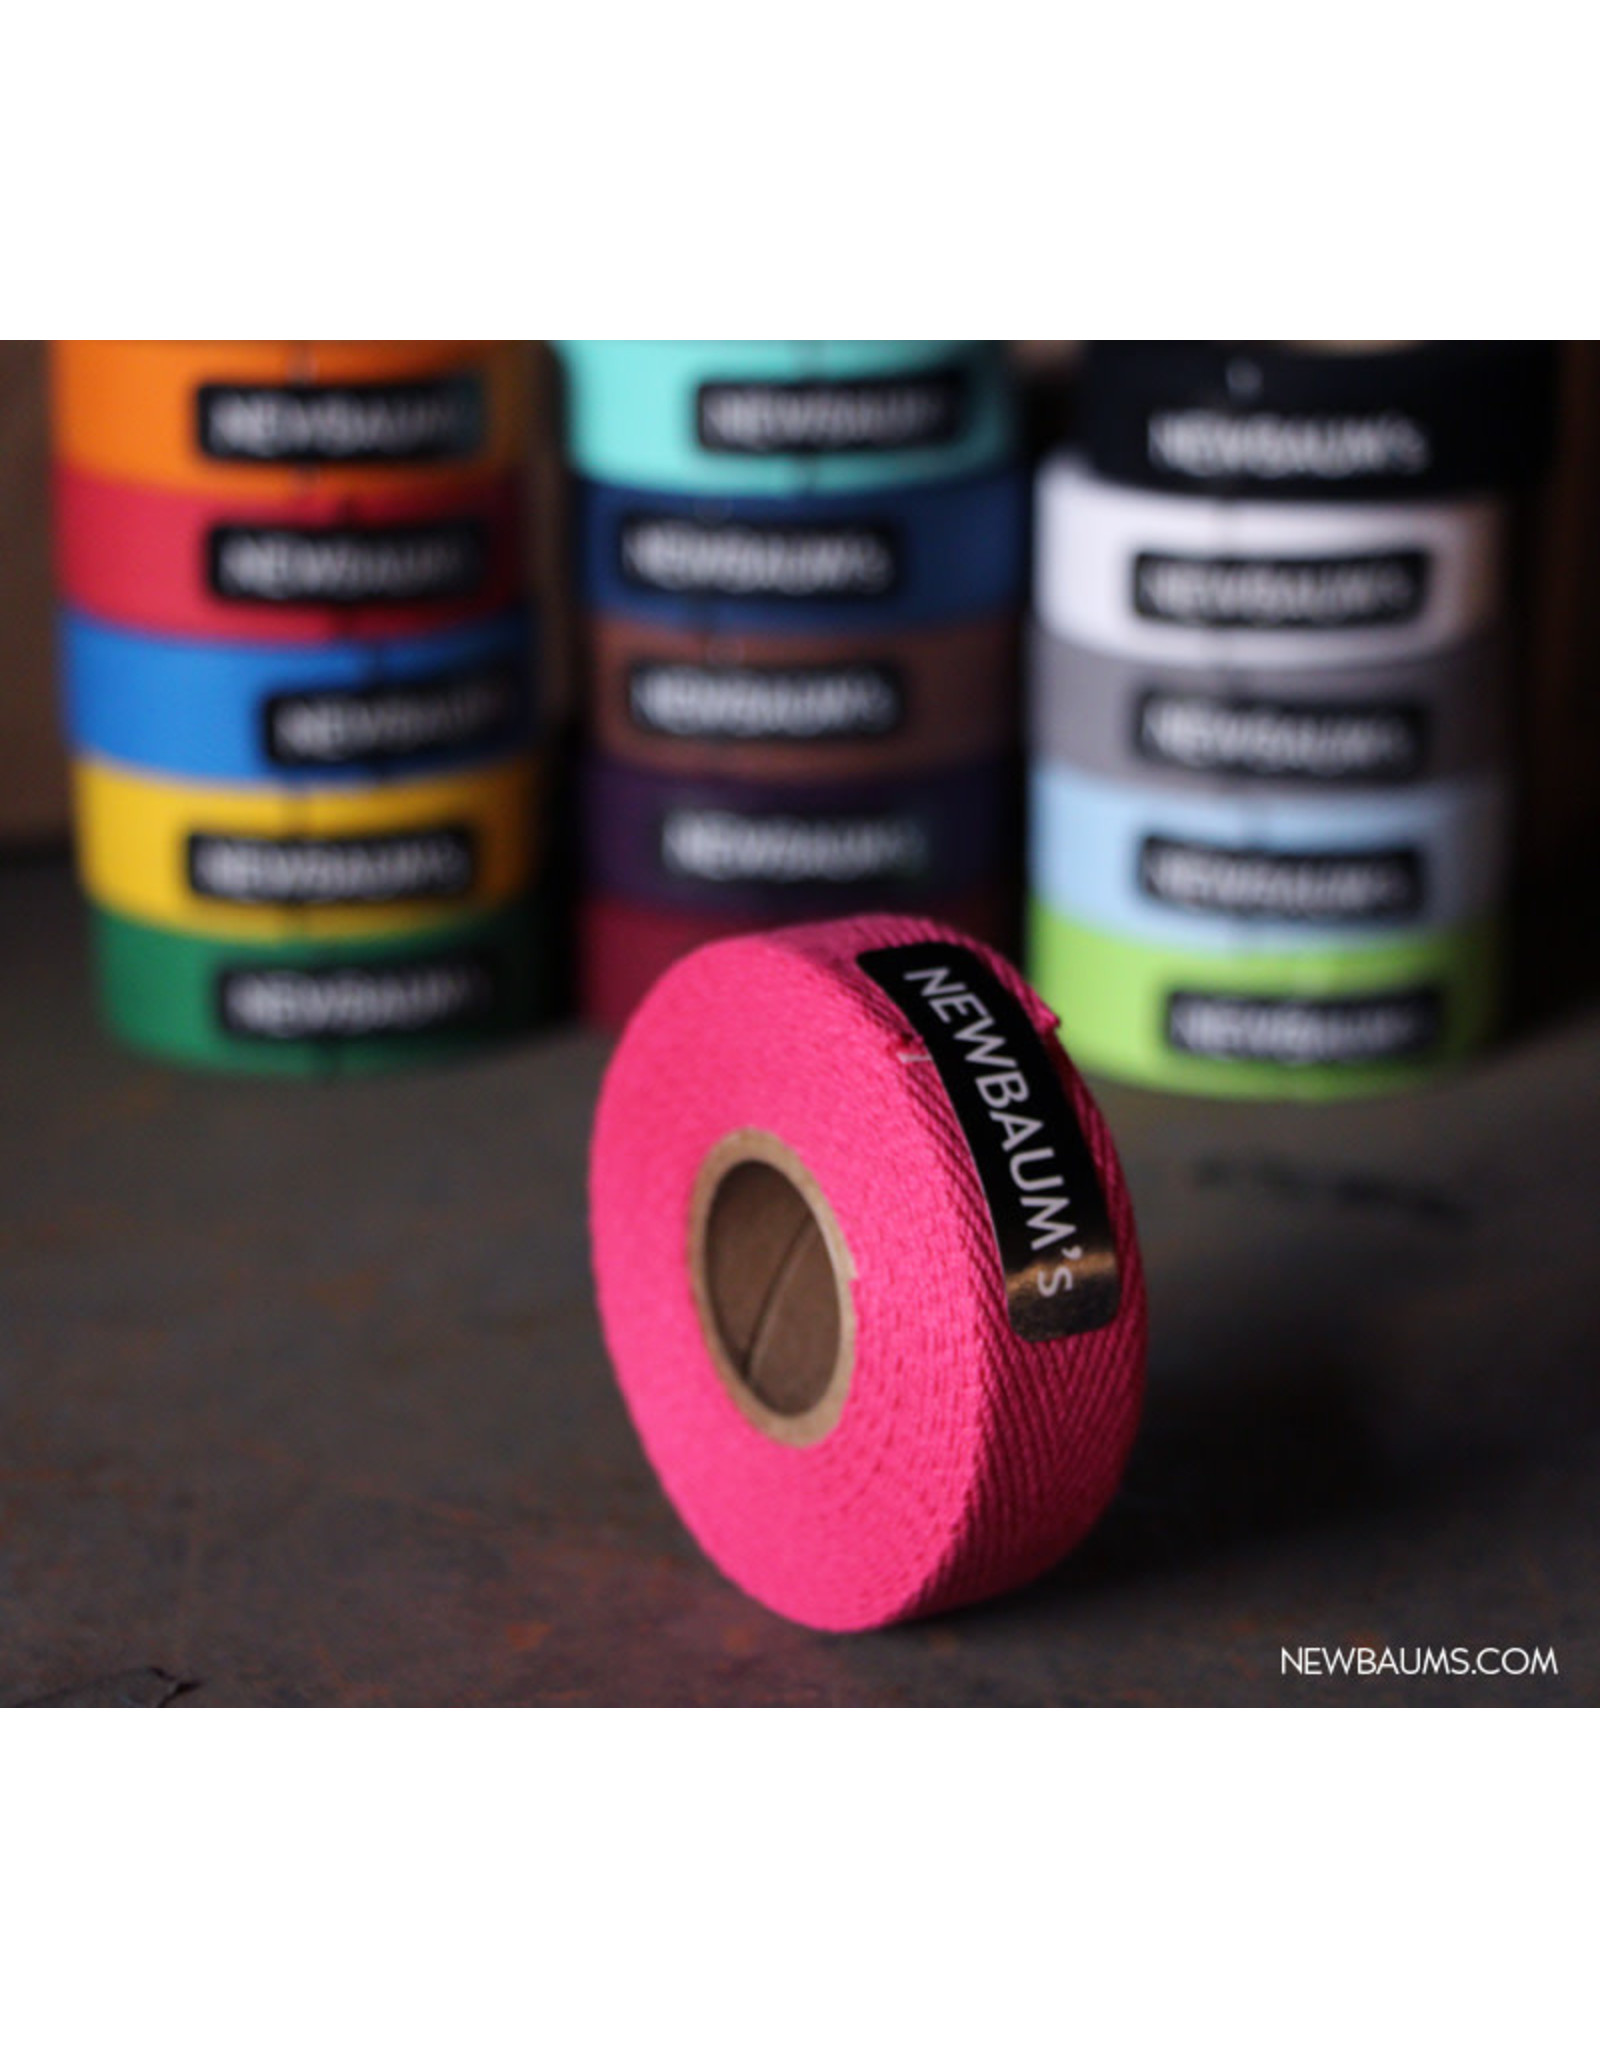 Newbaums Newbaum's Cotton Cloth Handlebar Tape